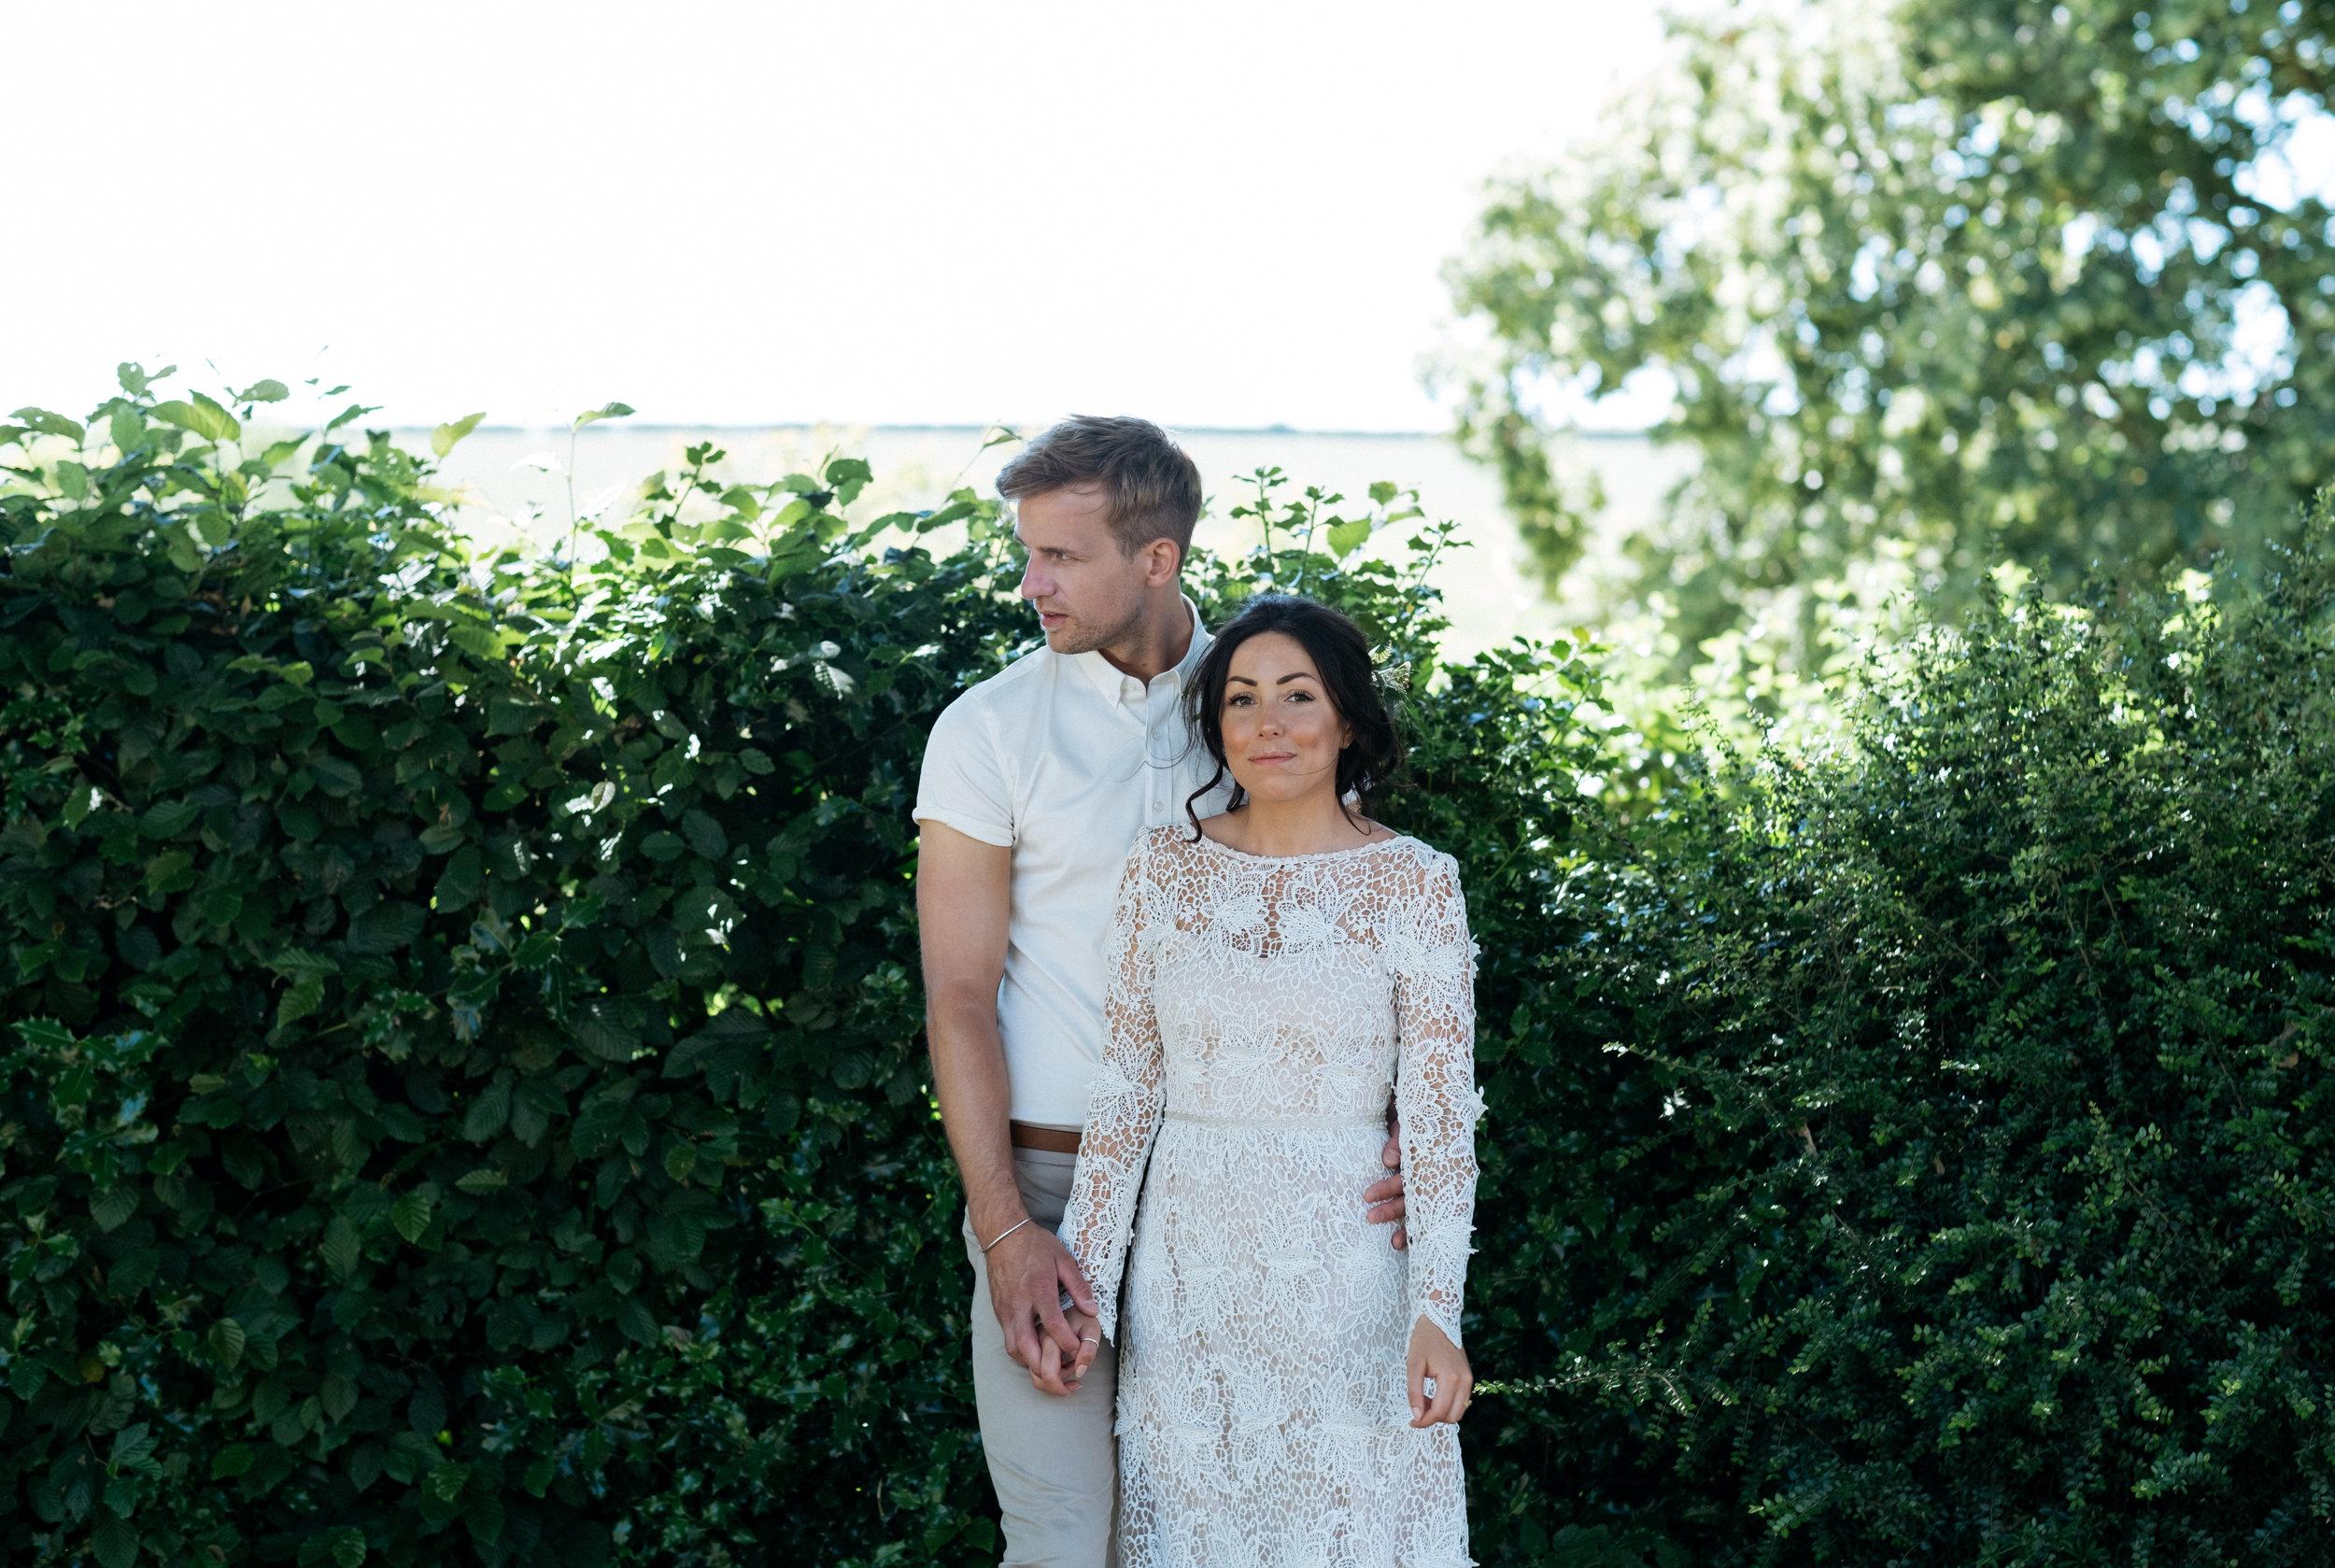 Beautiful alternative wedding couple portrait